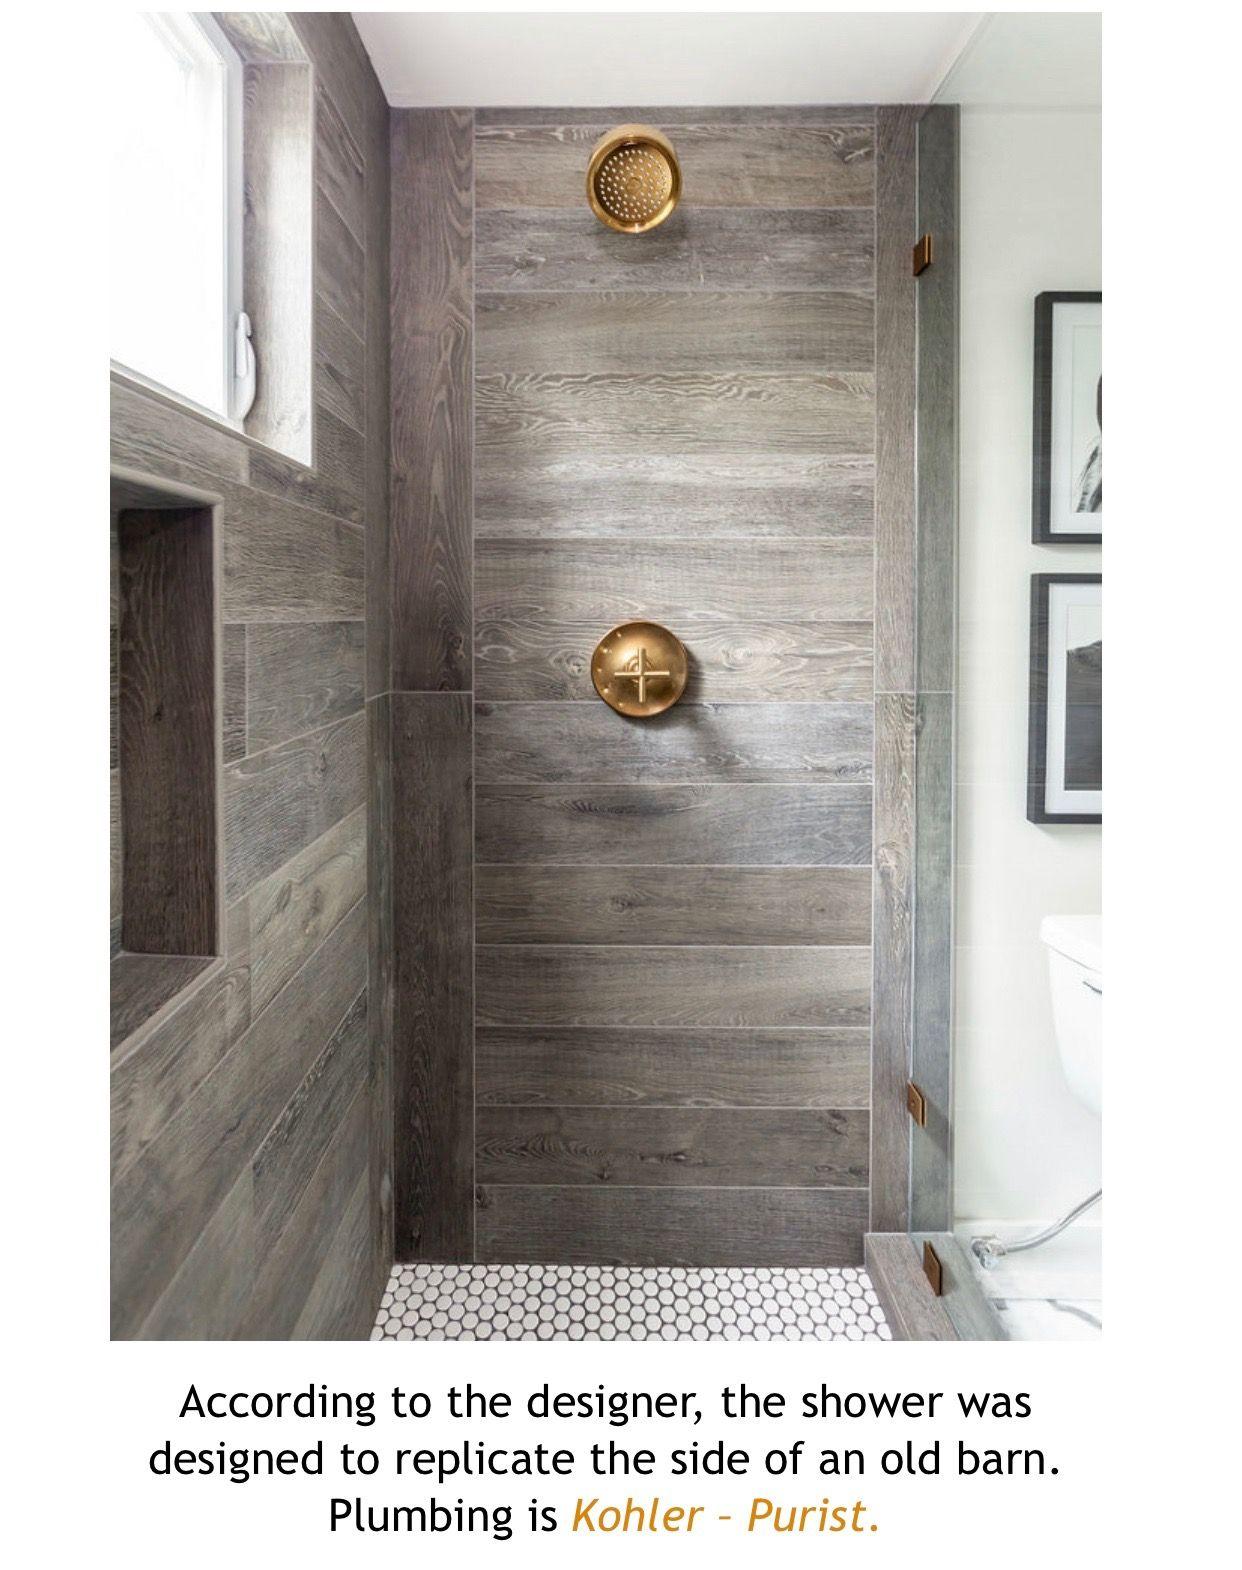 Pin By Christy Pilkington On Tile Ideas Old Barn Bathtub Door Handles